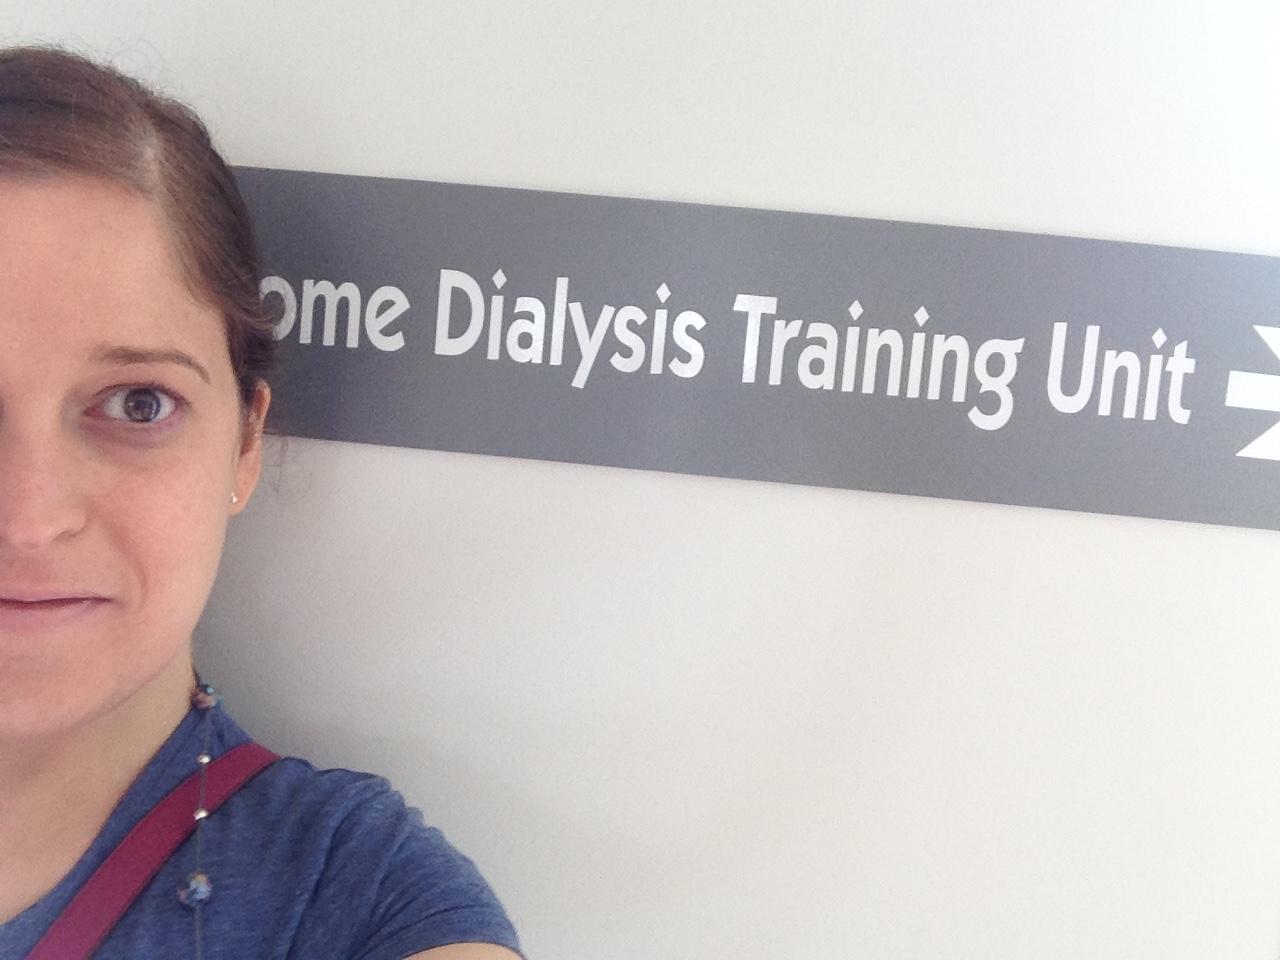 Chorley Home Dialysis Training Unit.